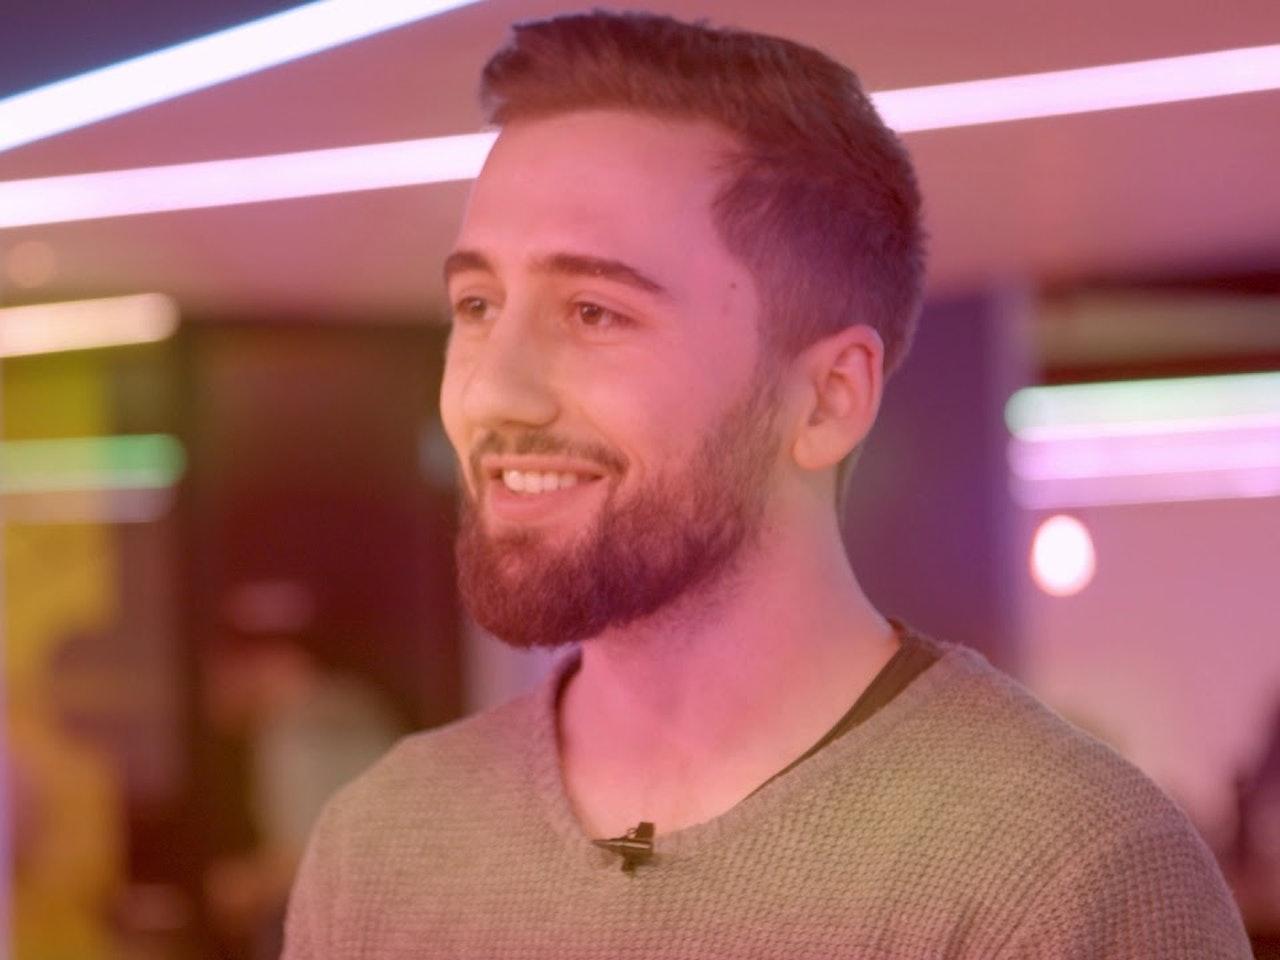 Fundraising Bootcamp testimonial - Cris Anton, MeetInVR